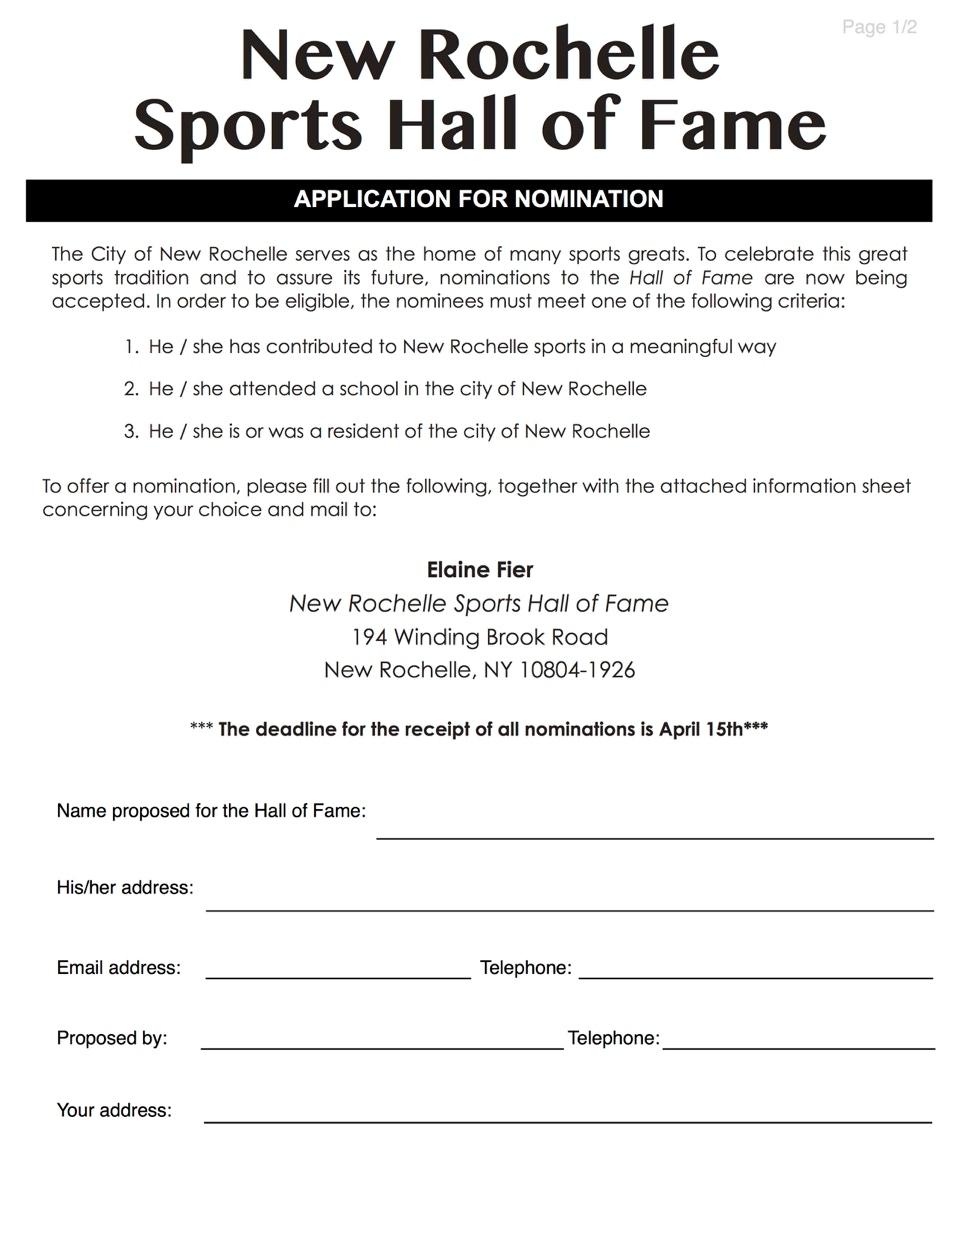 nomination form pdf